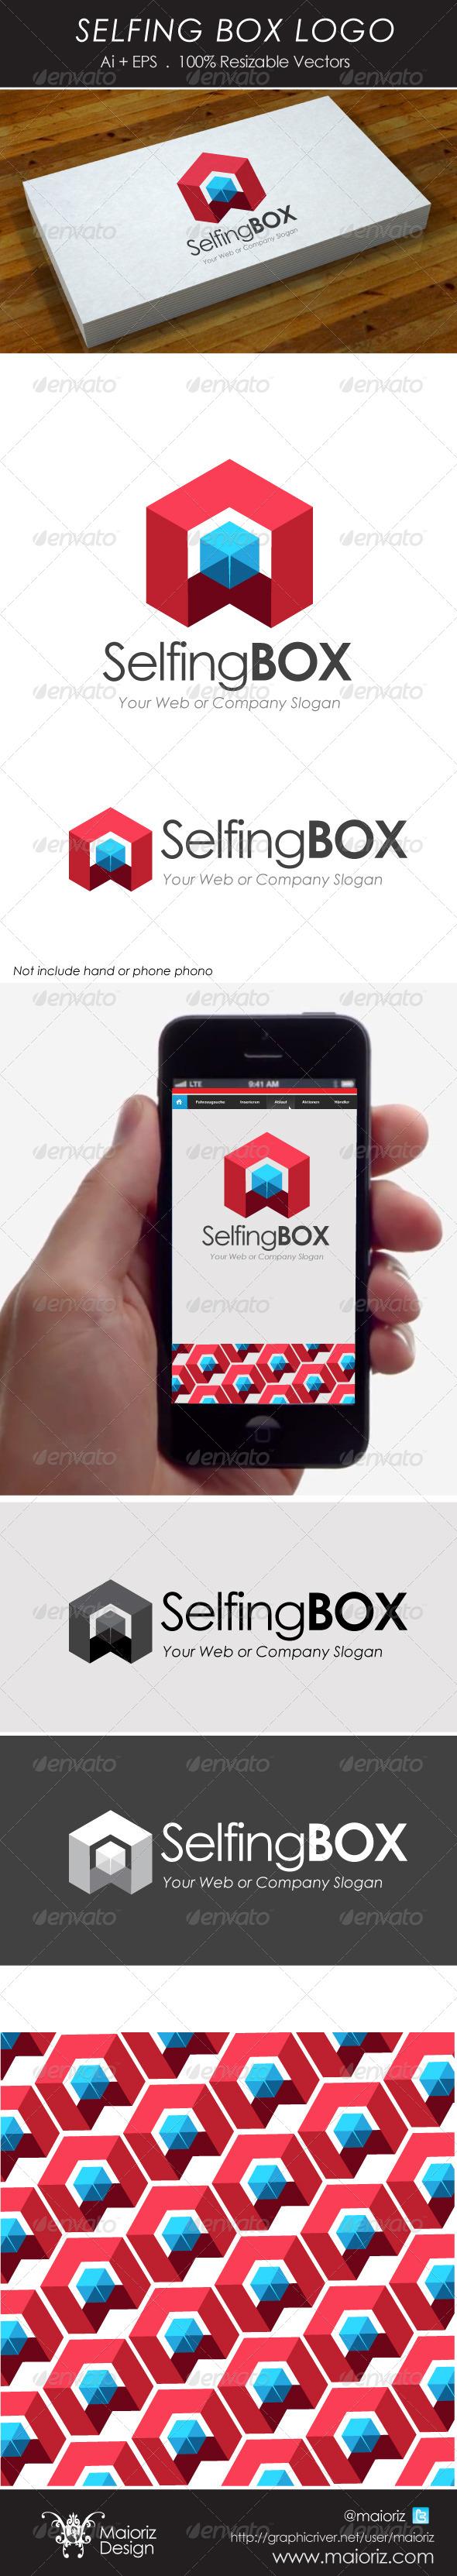 Selfing Box Logo - 3d Abstract